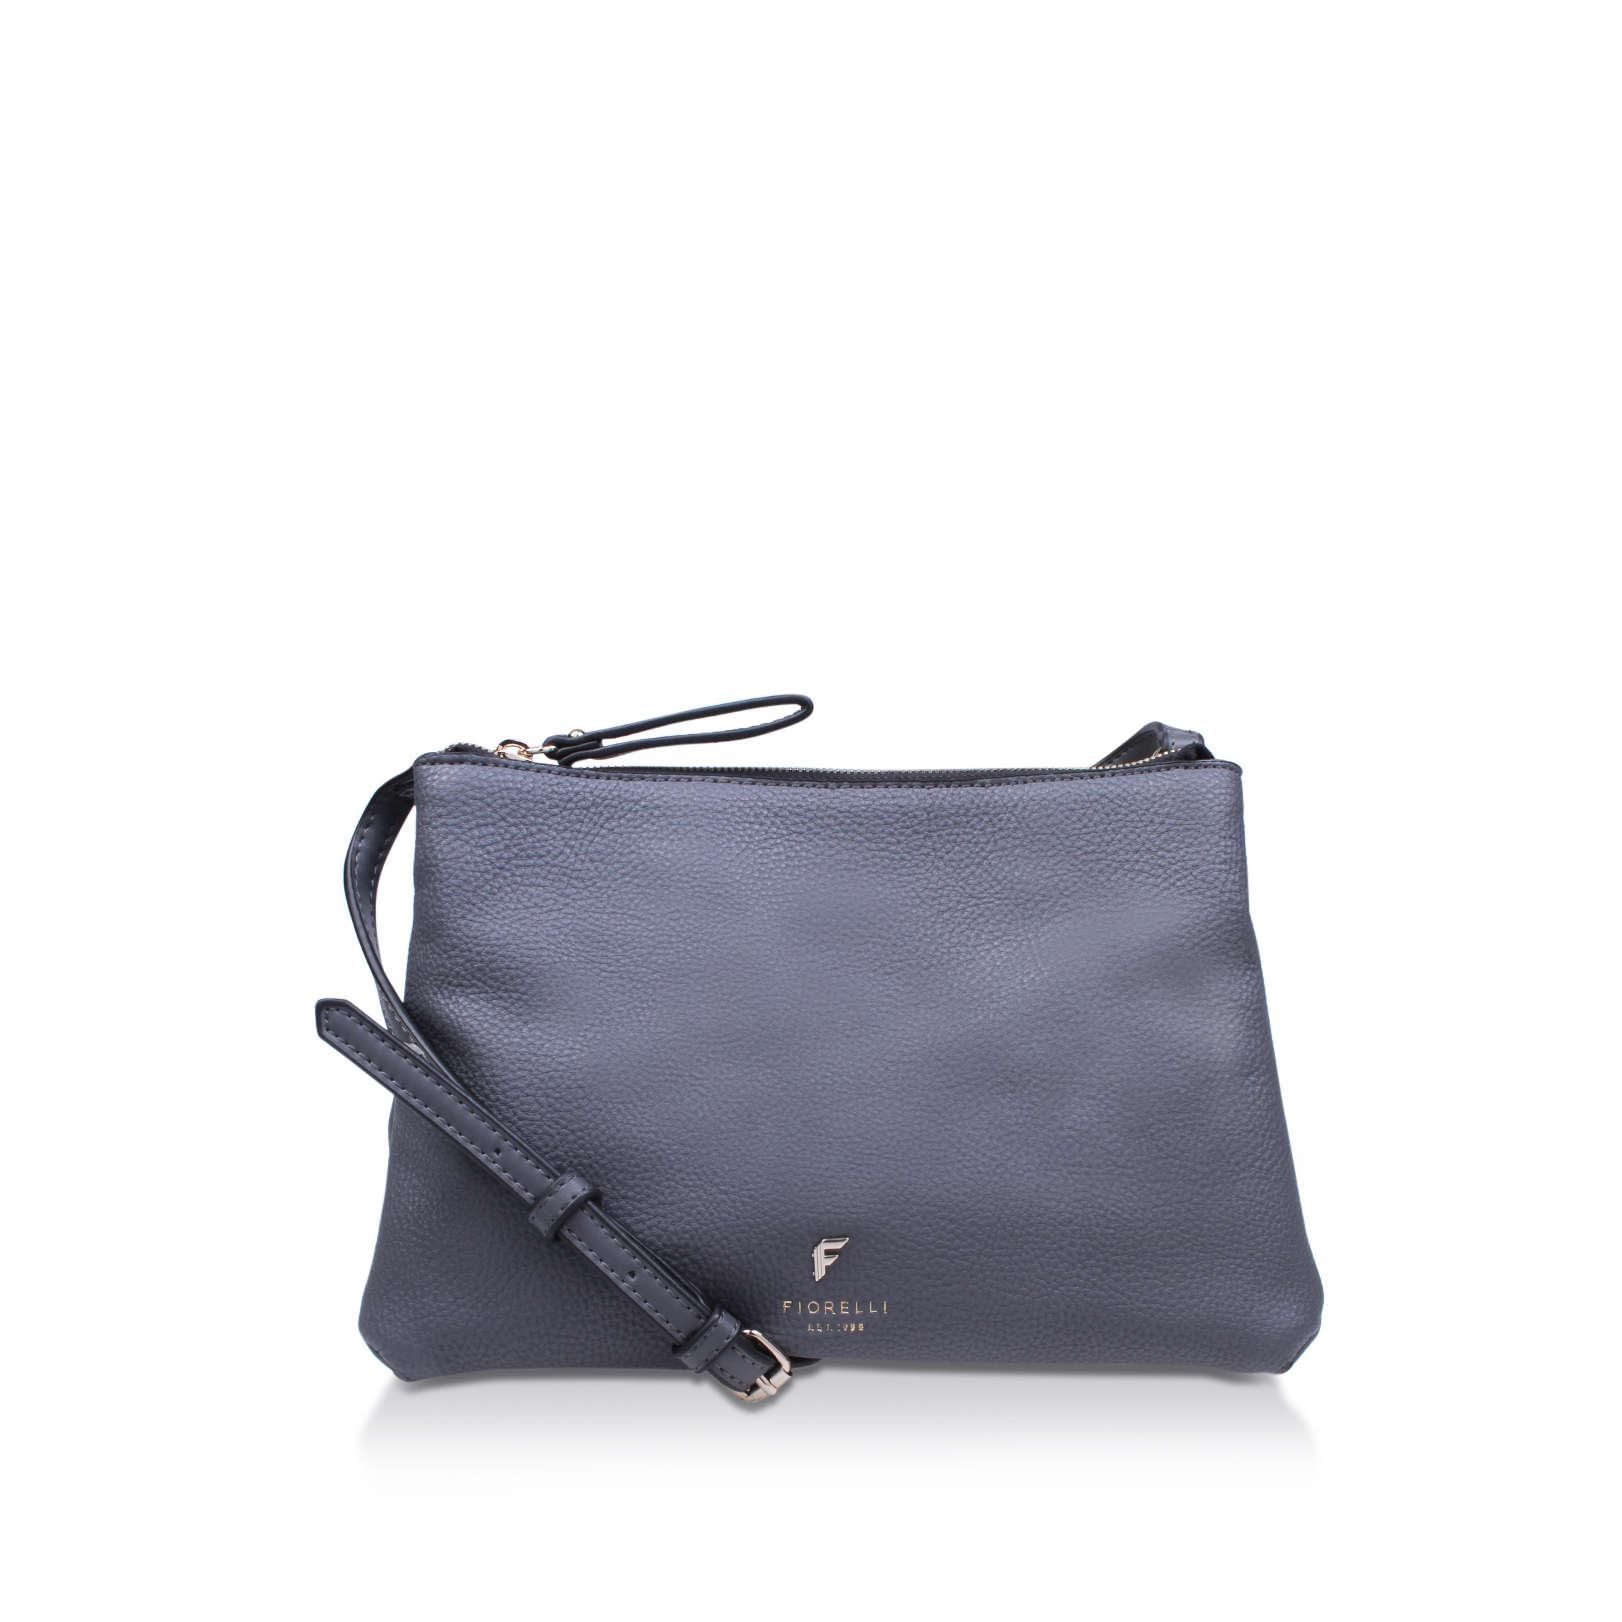 9de3cd381b DAISY Fiorelli Daisy Grey Handbag by FIORELLI